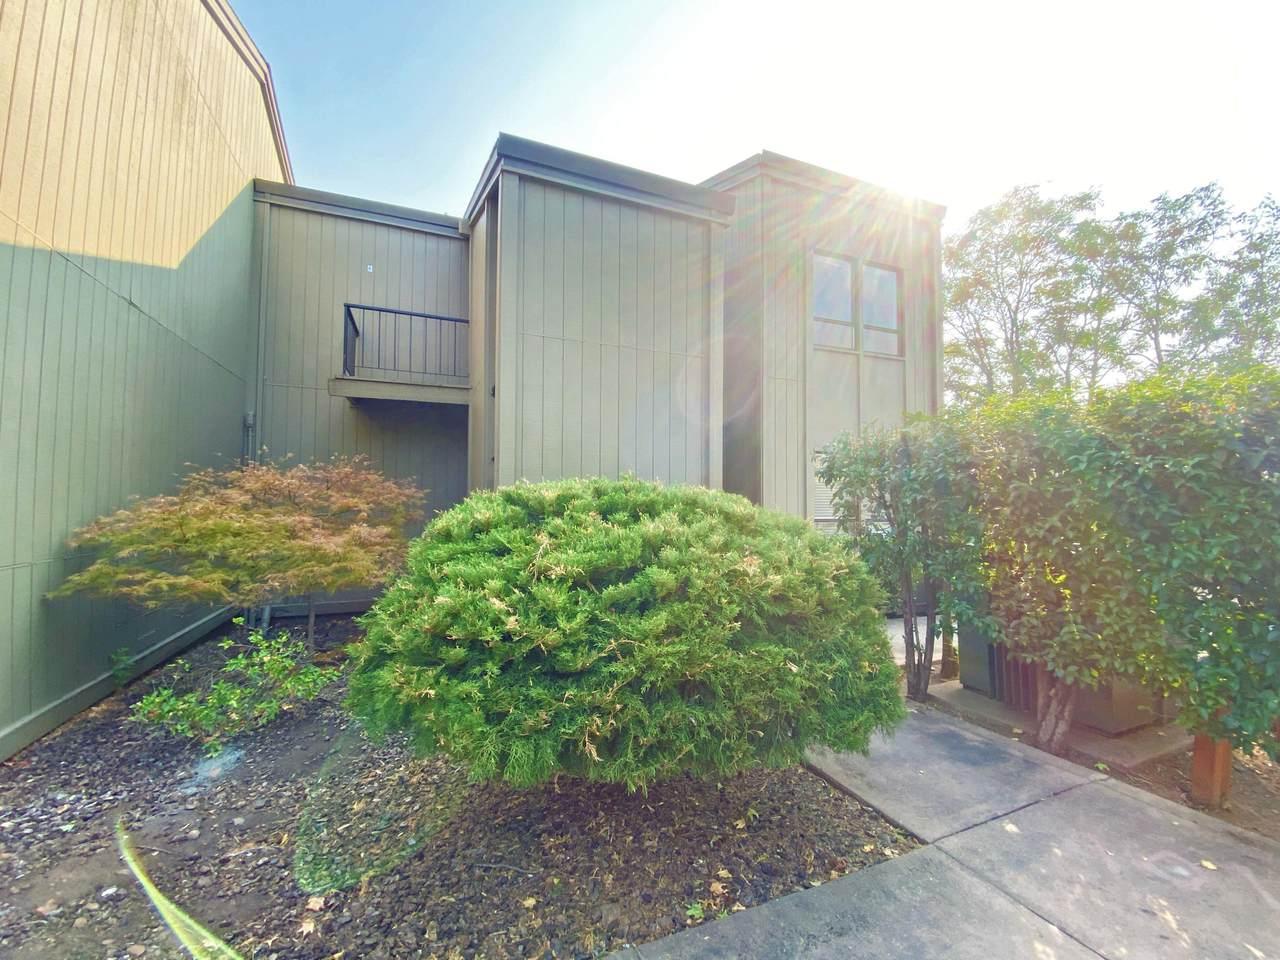 5000 Bechelli Lane, Suite 104 - Photo 1